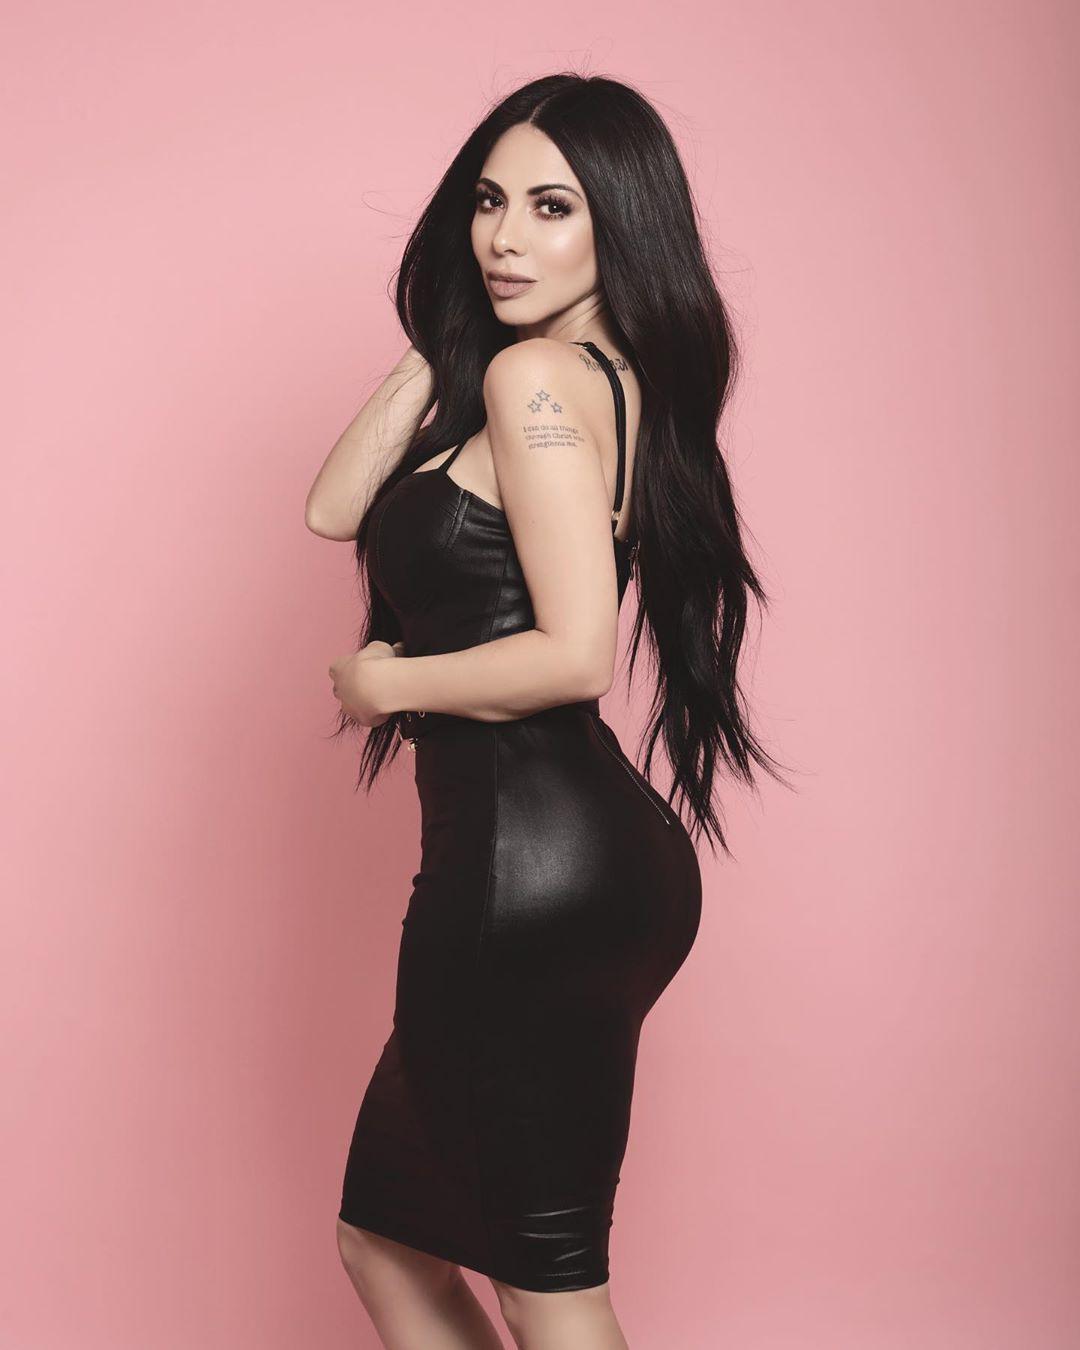 Stay in trend with fashion model, Jimena Sanchez